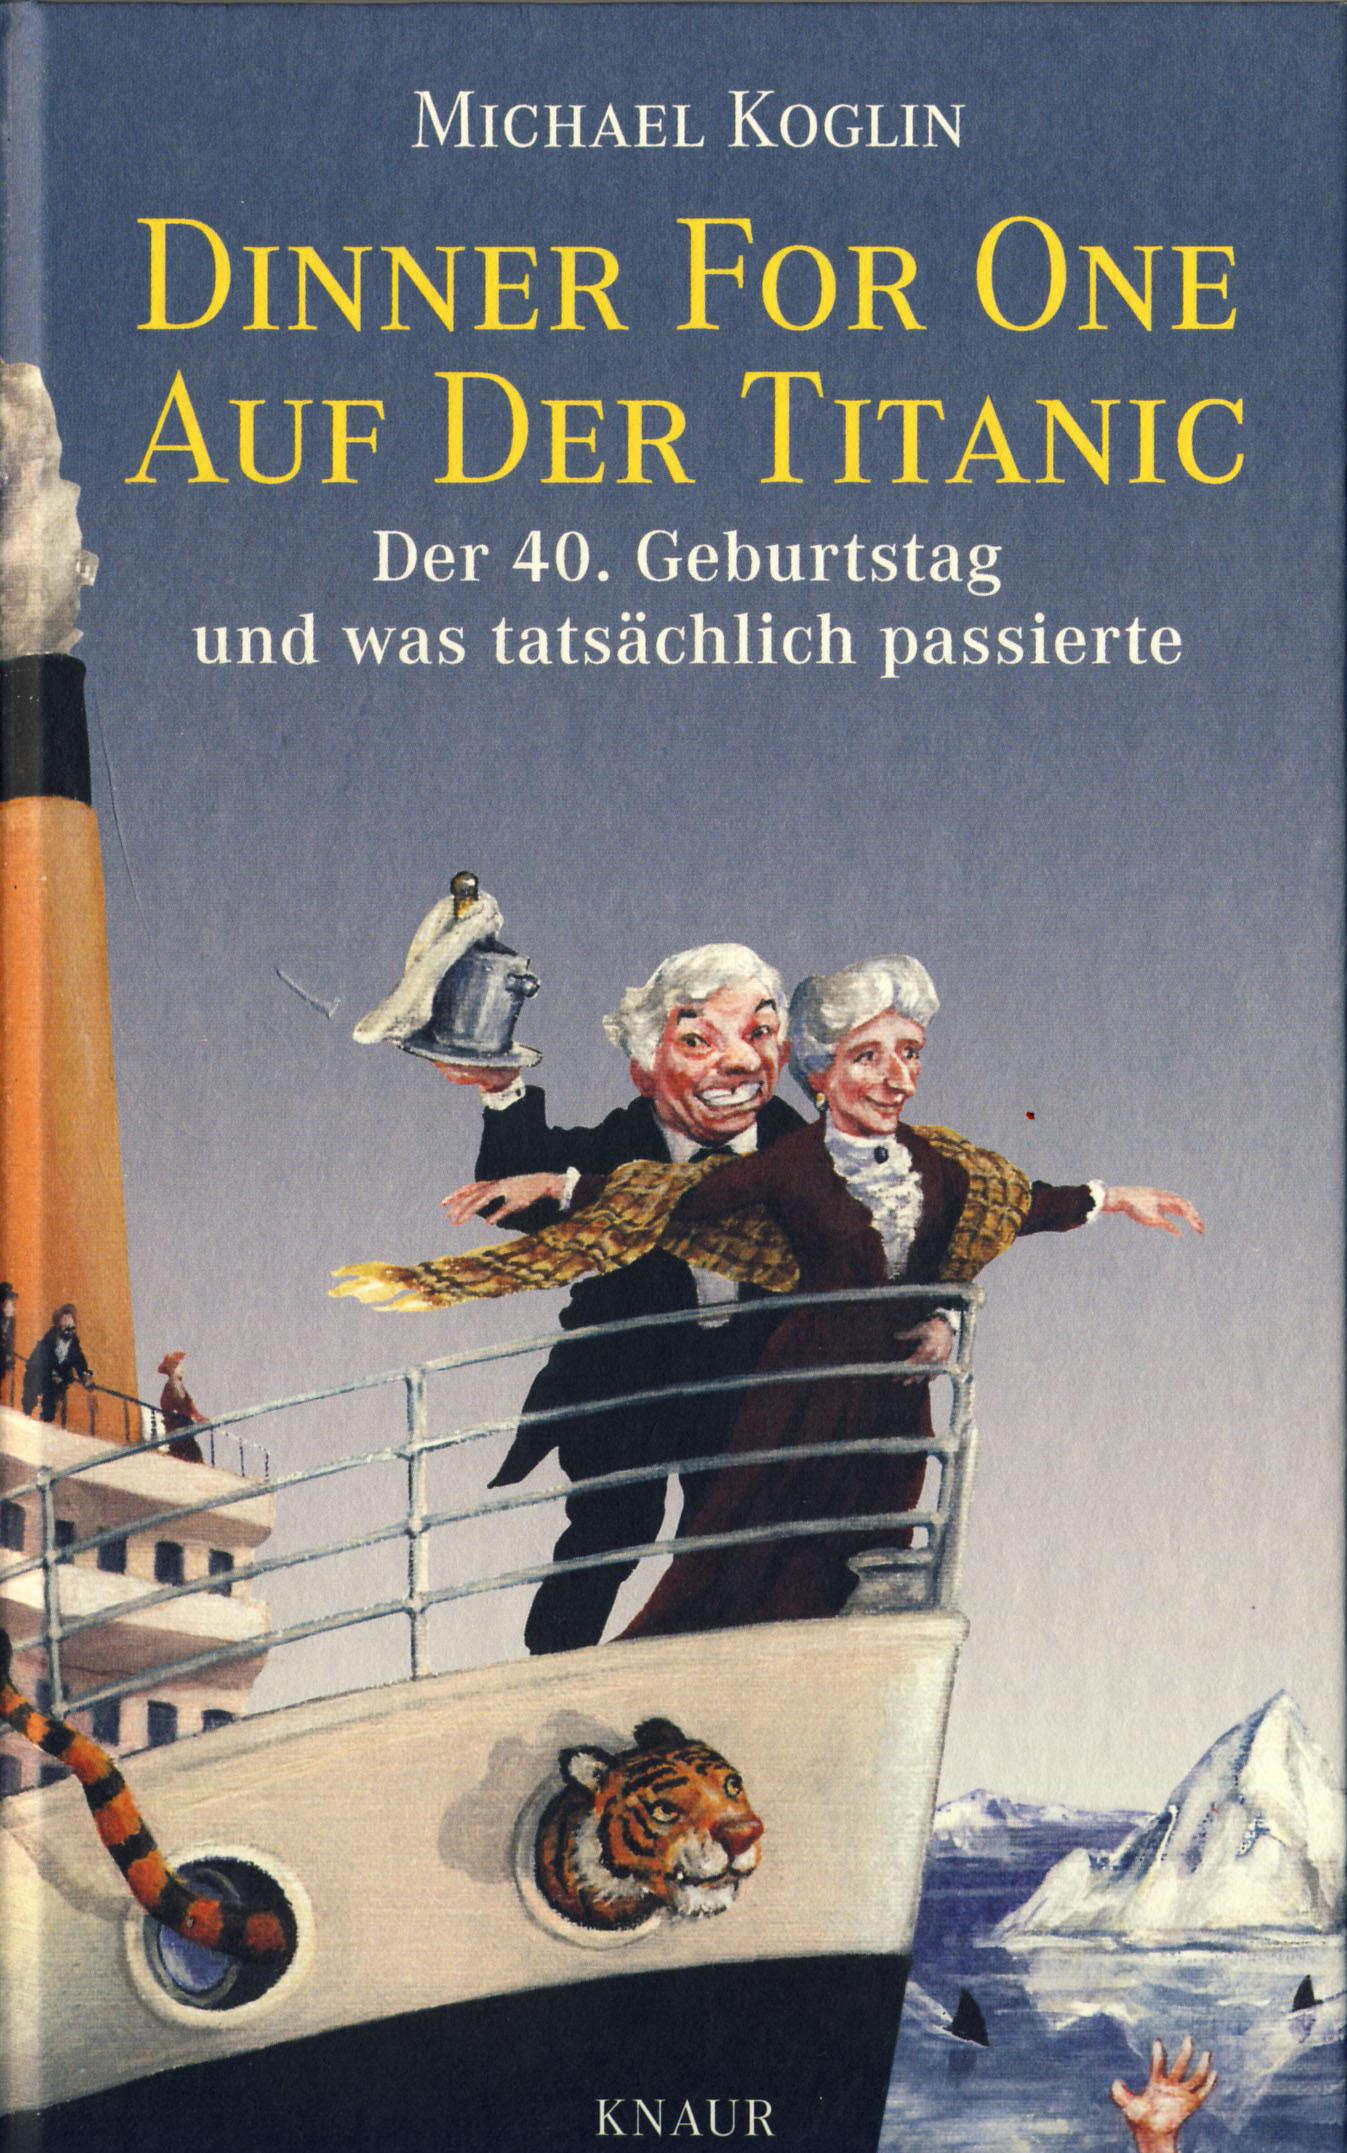 Buecher-Rudi-Hurzlmeier - Titanic.jpg